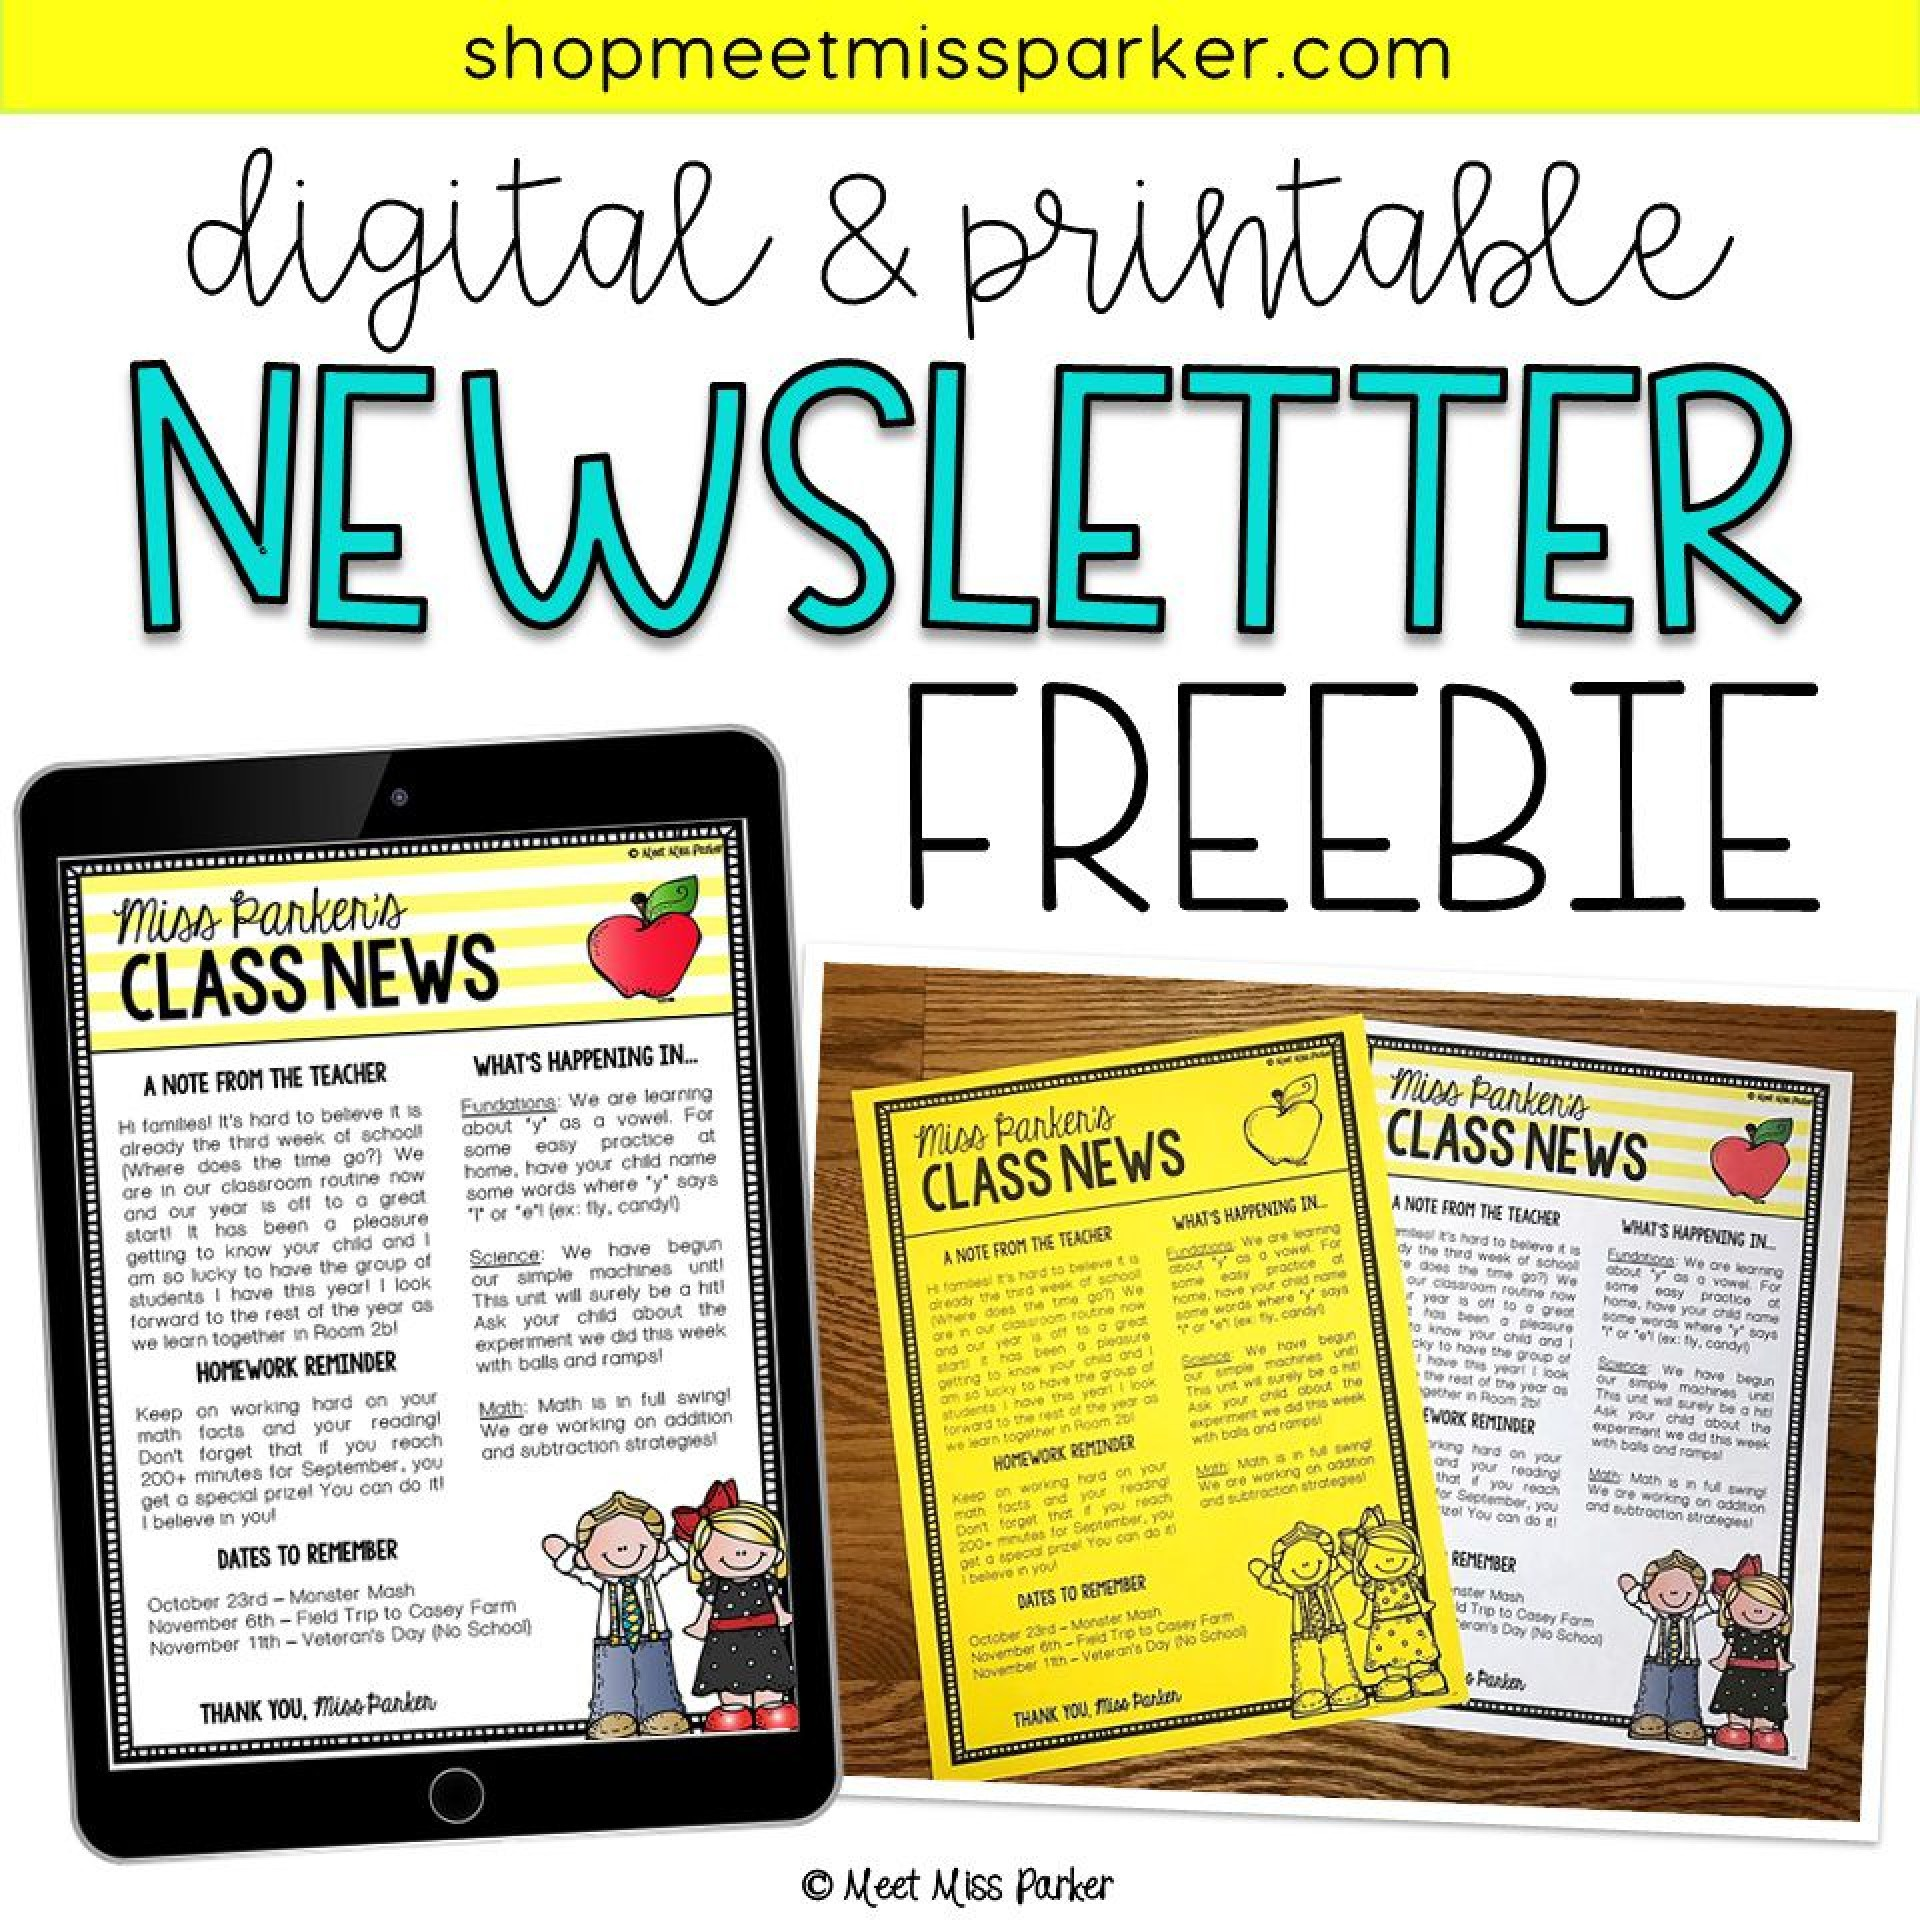 003 Impressive Newsletter Template For Teacher High Def  Teachers To Parent Free Printable Digital1920